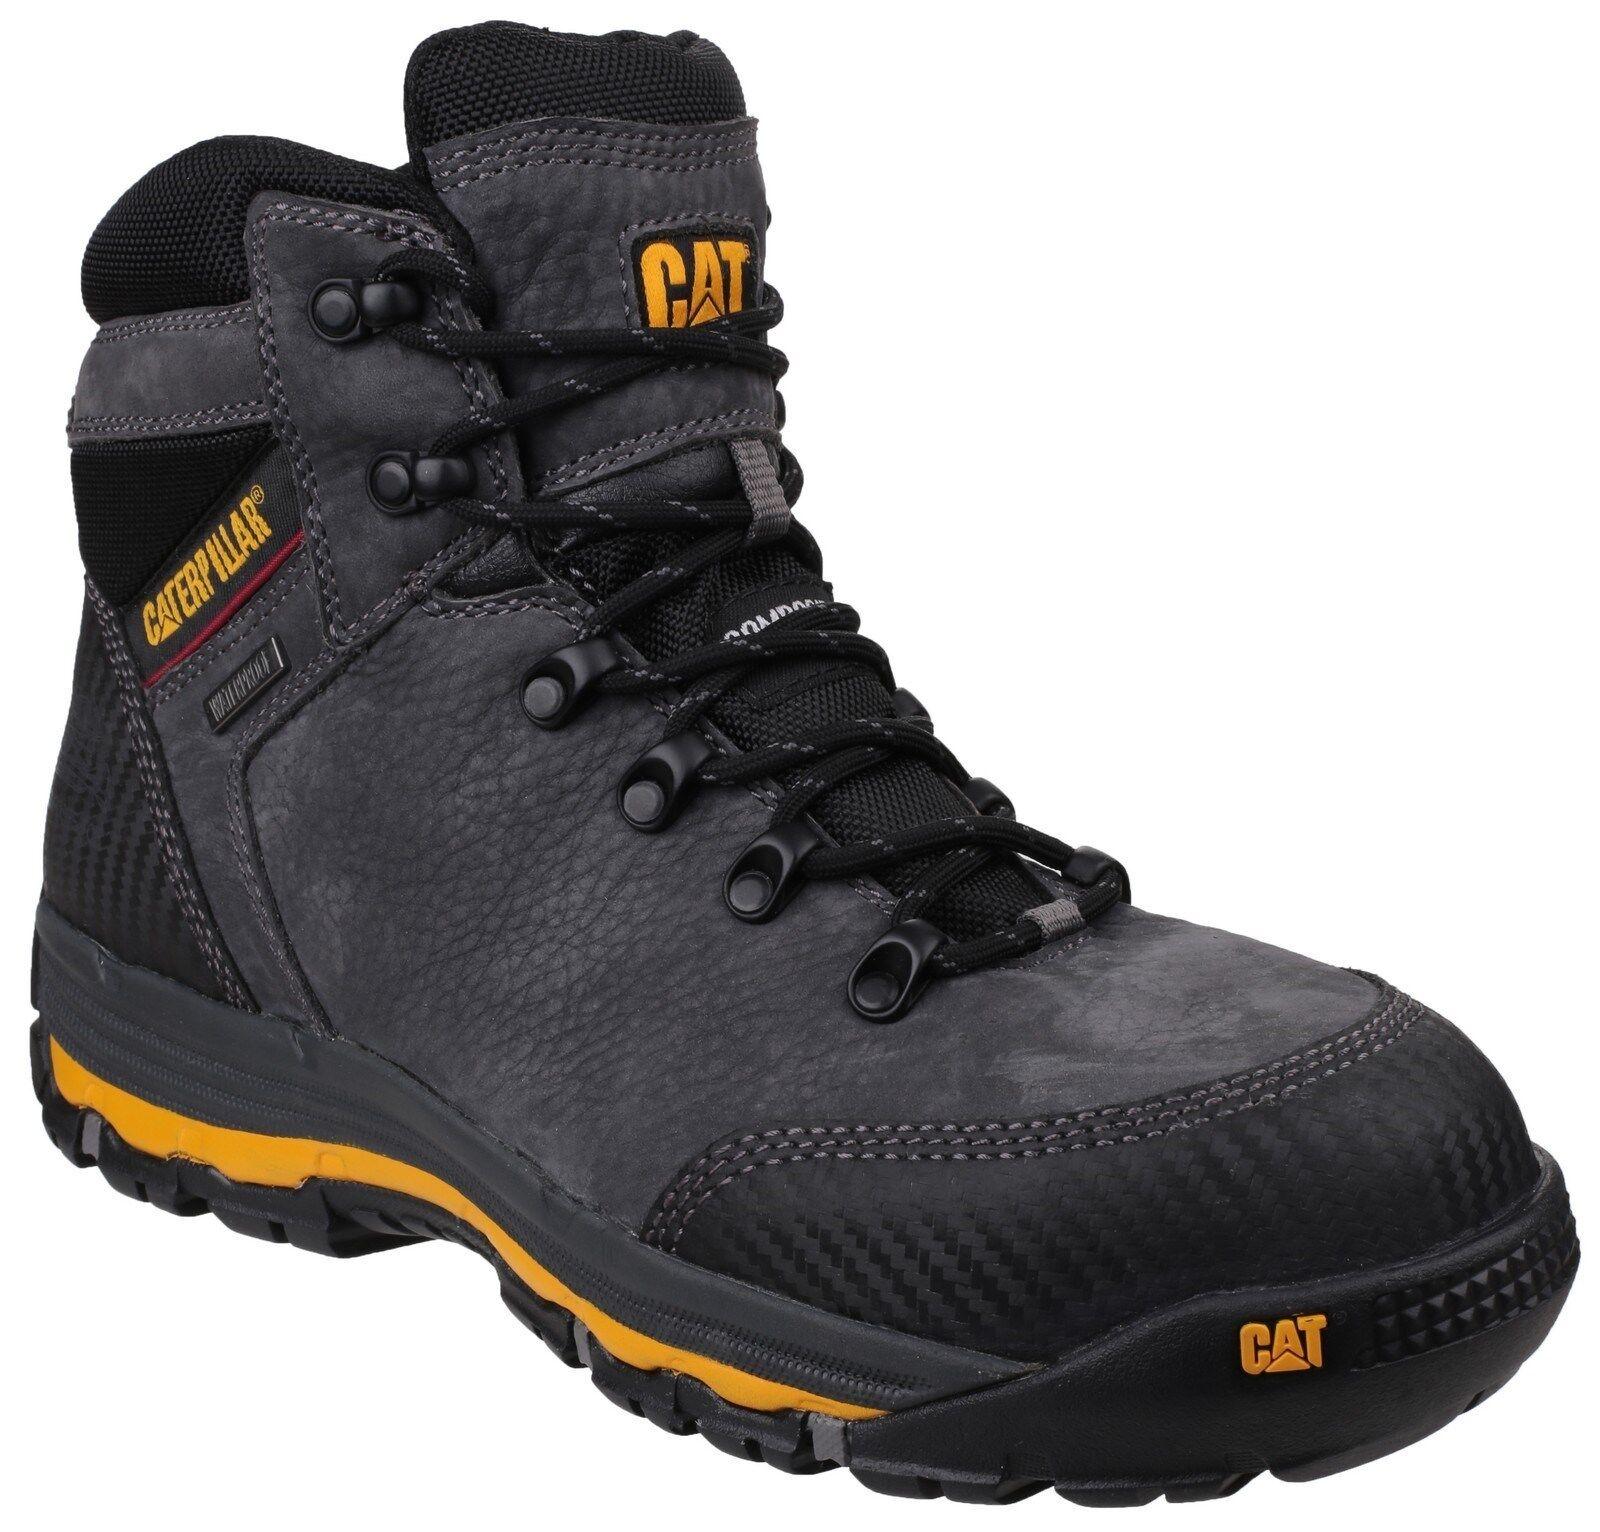 CAT Caterpillar Munising Waterproof Safety Industrial Work Mens Boots UK6-12